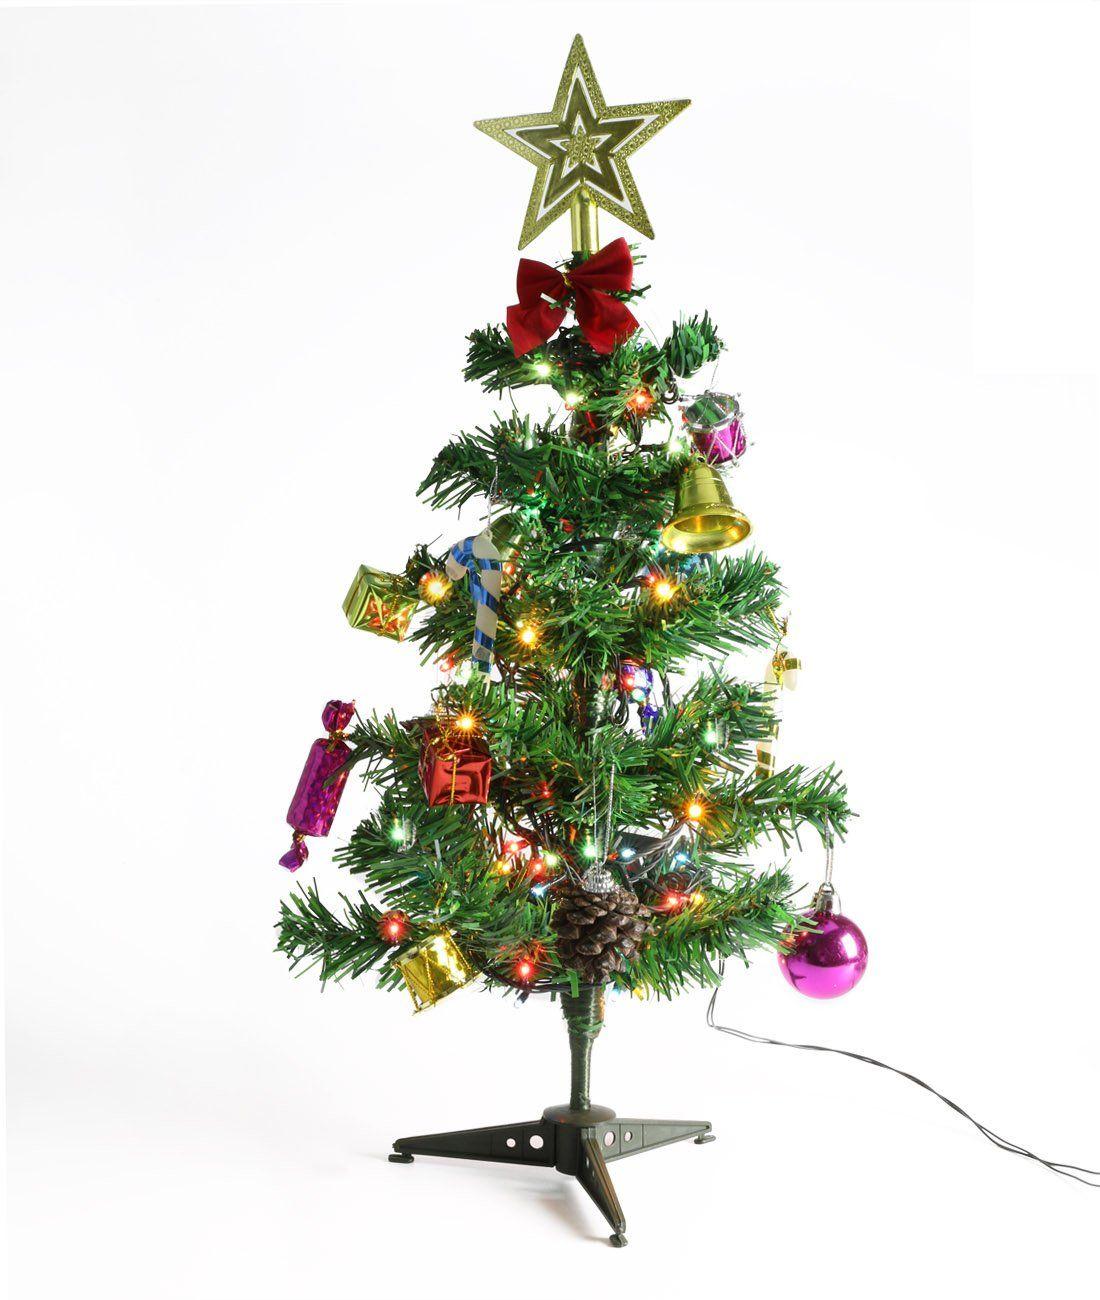 Christmas Tree Trofoty 50cm Artificial Christmas Tree with ...